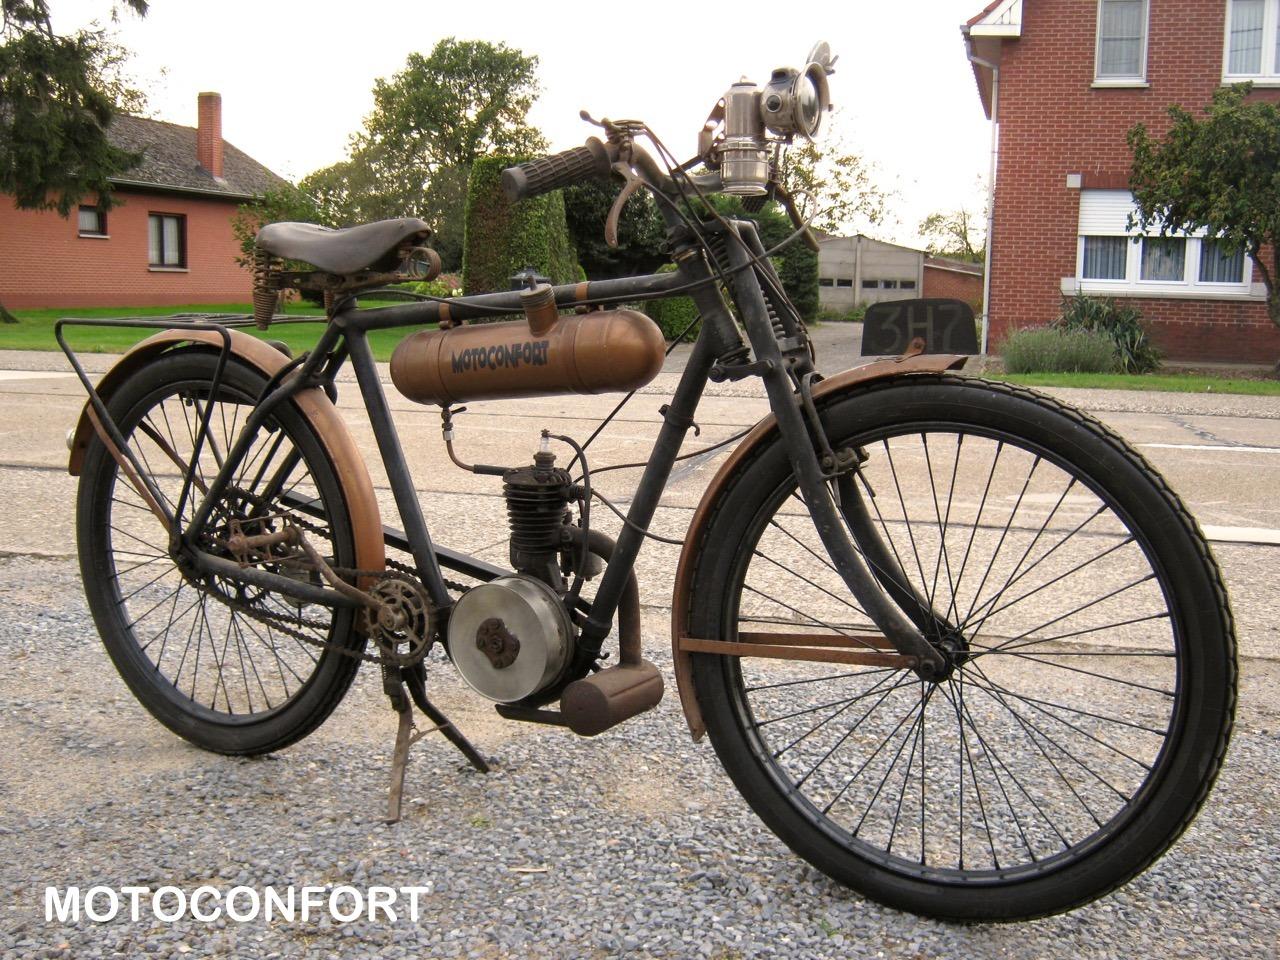 motoconfort-3